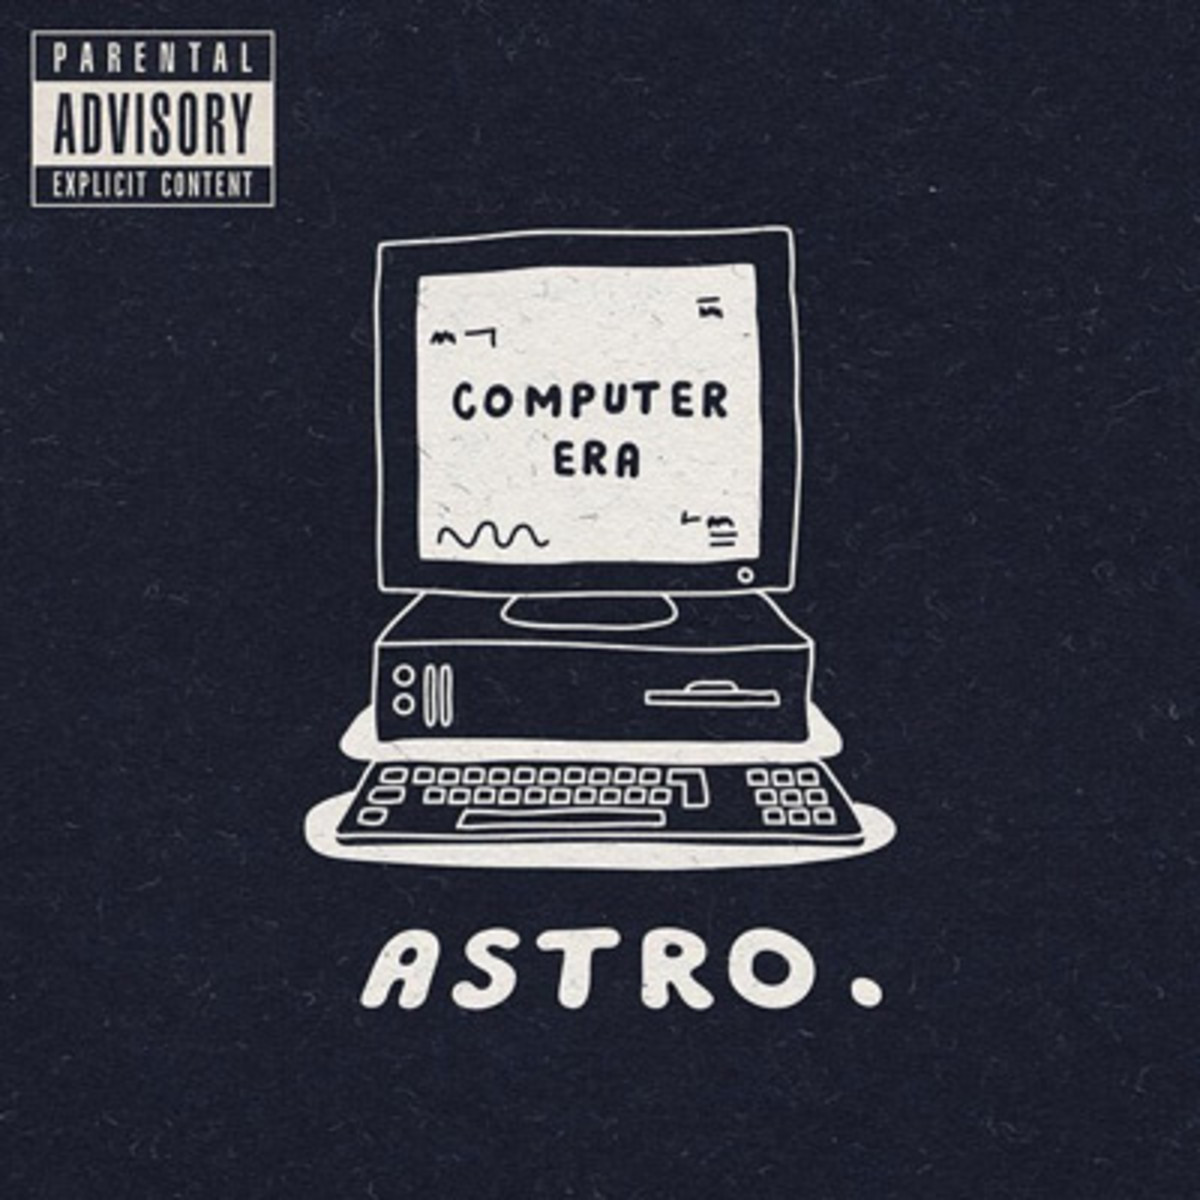 astro-computerera2.jpg